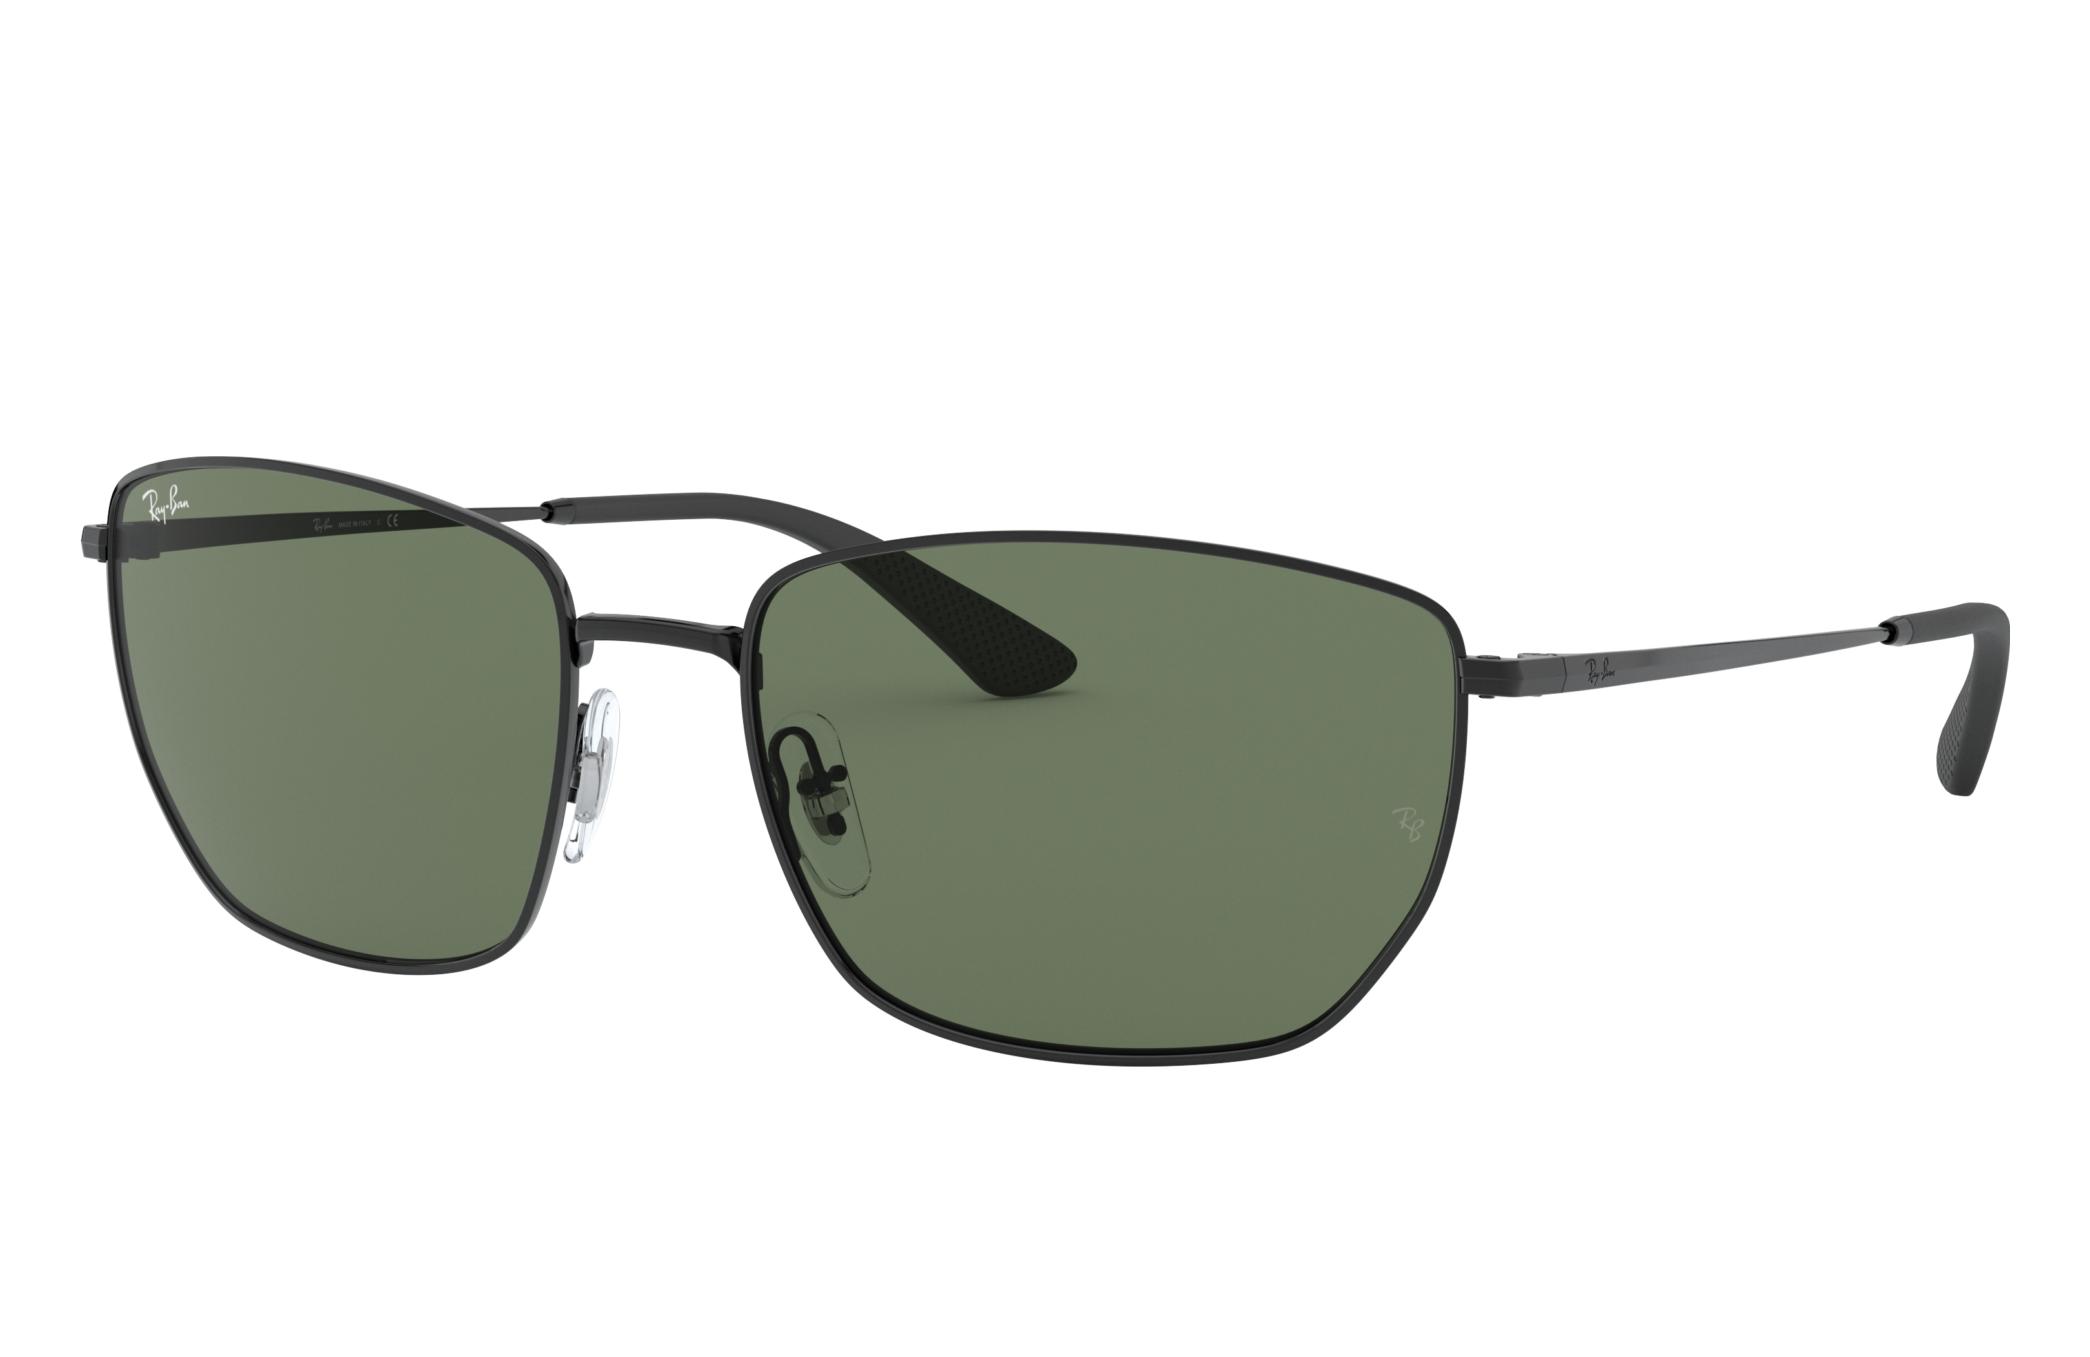 Ray-Ban Rb3653 Black, Green Lenses - RB3653